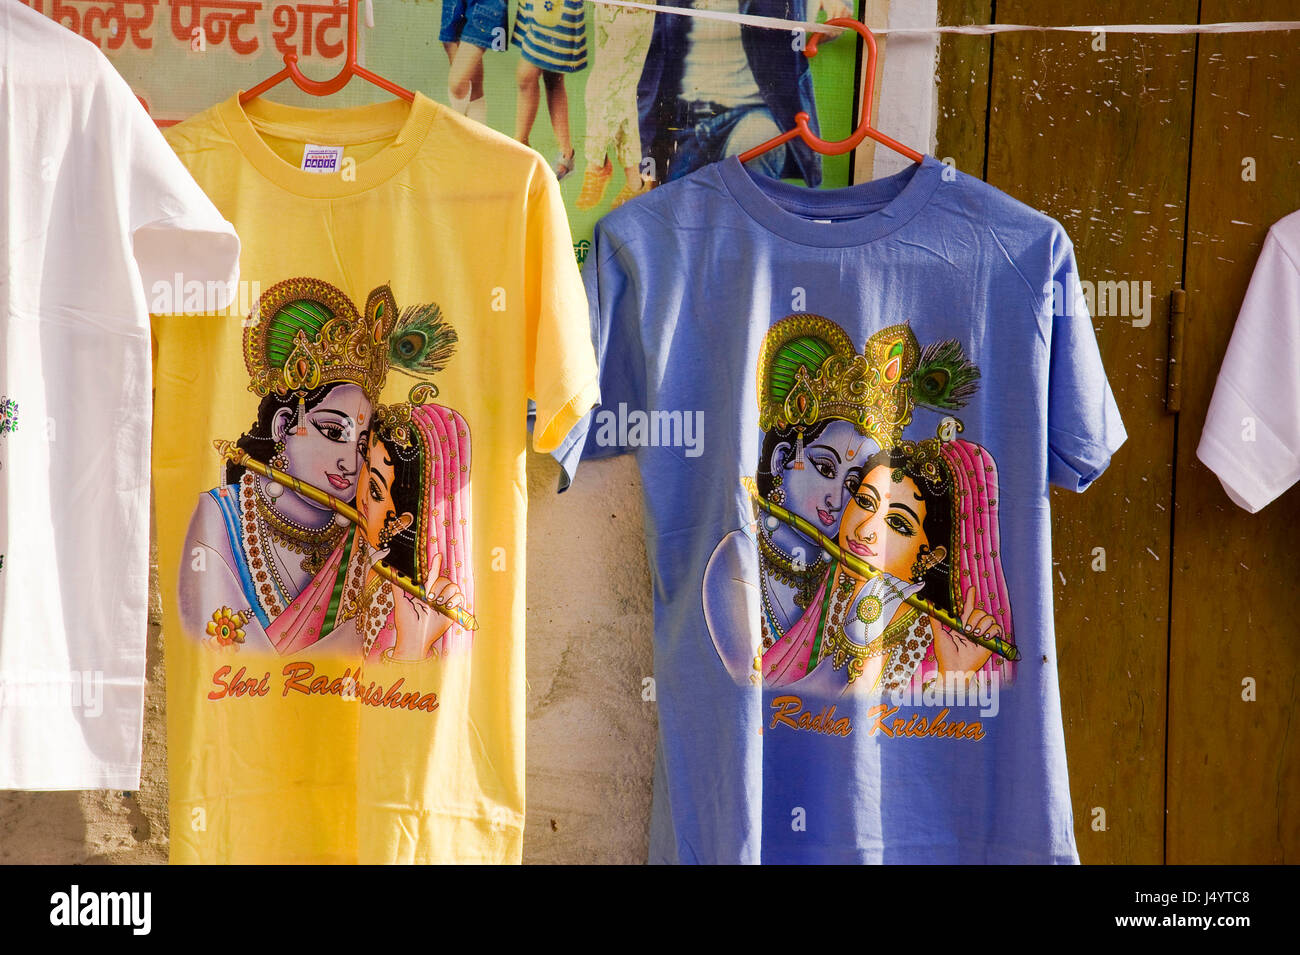 Radha krishna printed on t shirt, mathura, uttar pradesh, india, asia - Stock Image